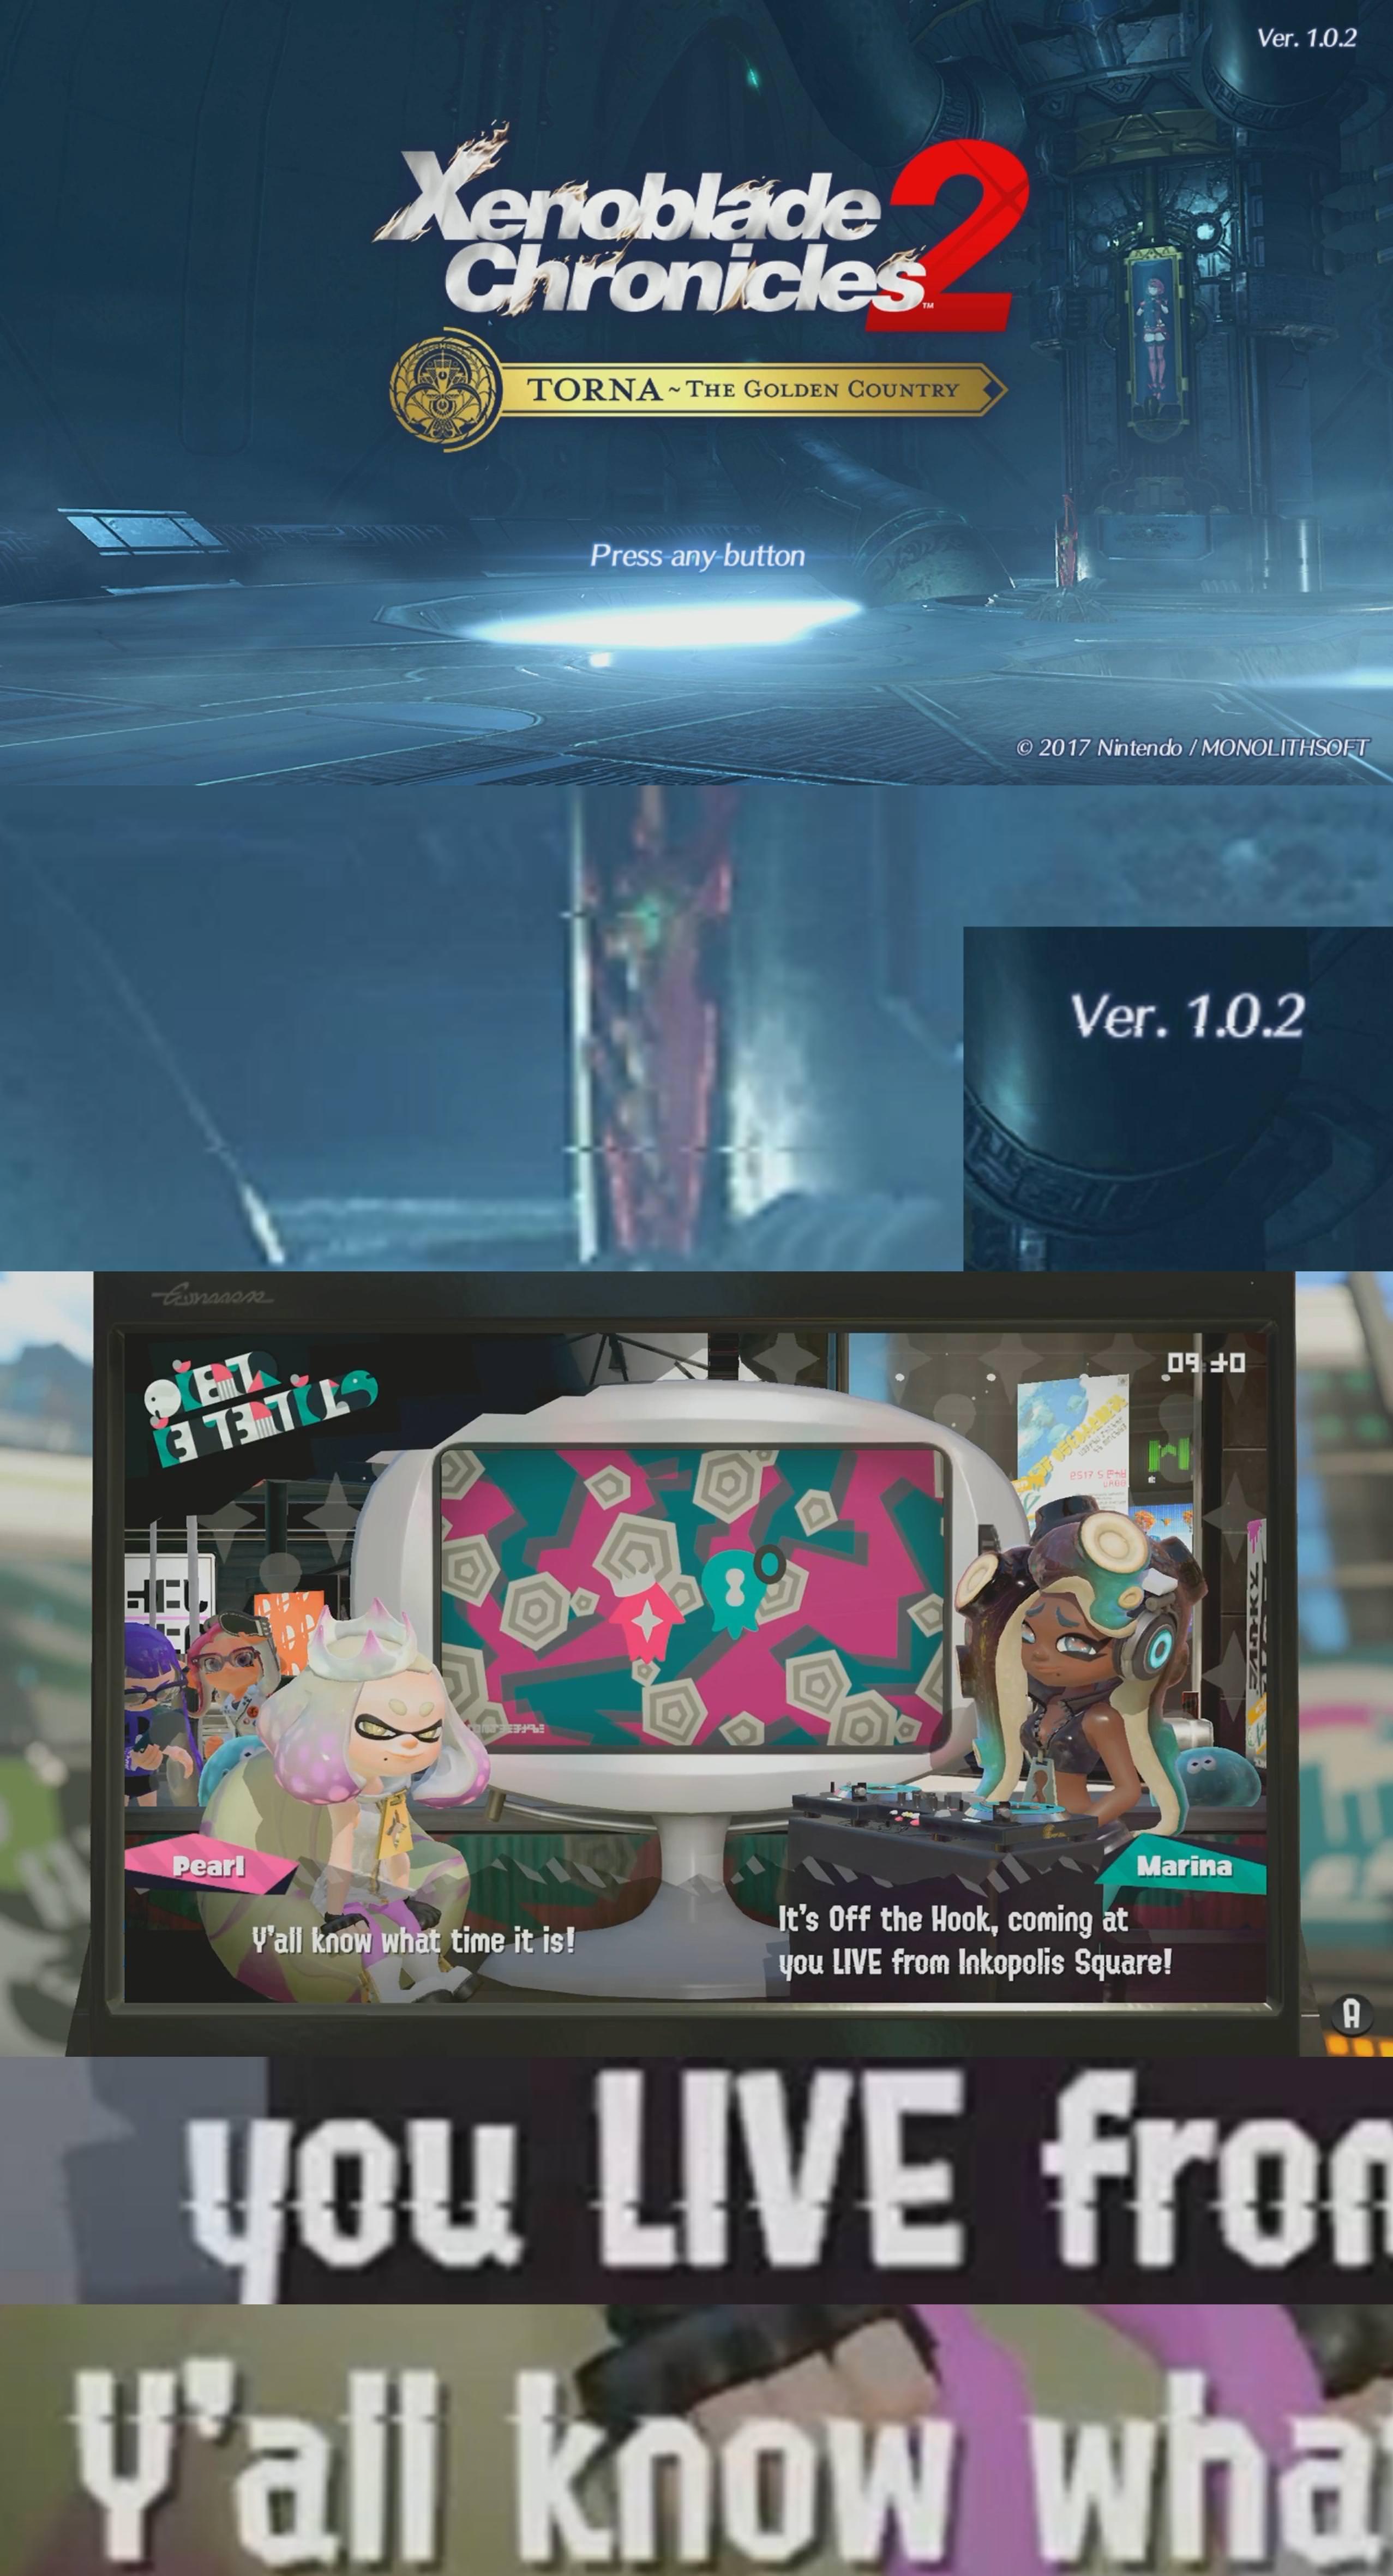 AV io HD Video Artifacts/Tearing - General - Epiphan Video